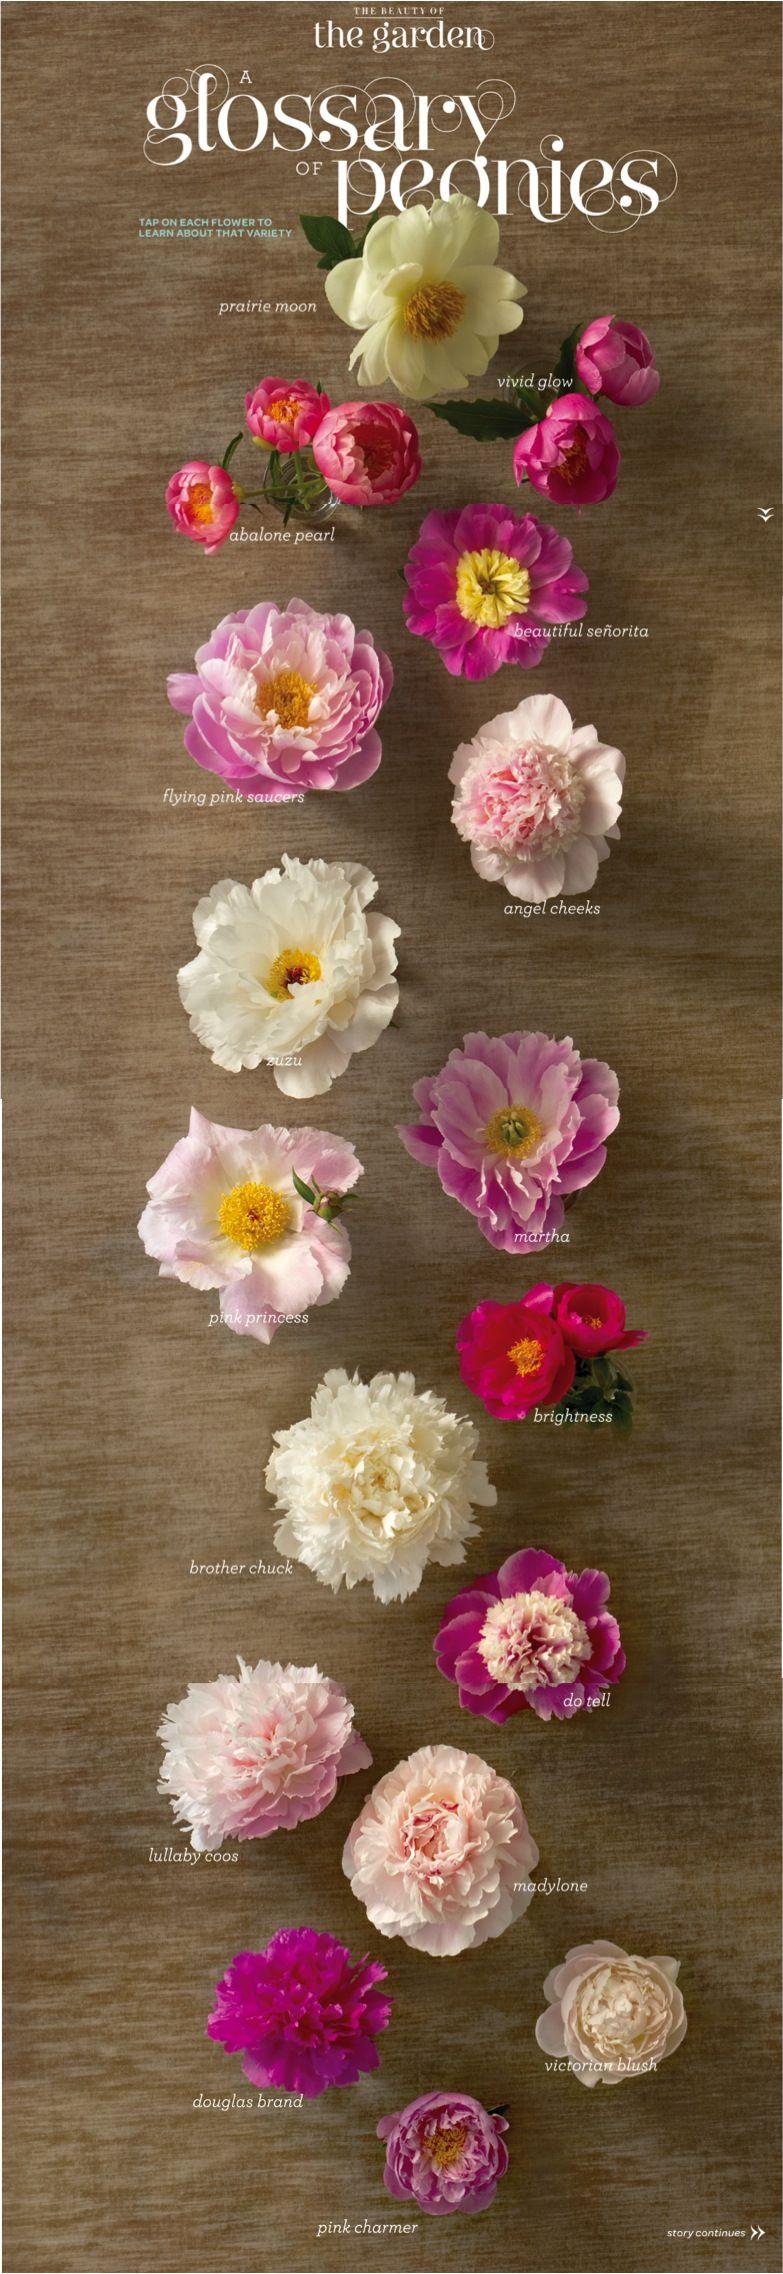 Peonies 101 | flowers//plants | Pinterest | Peony, Flowers and Gardens